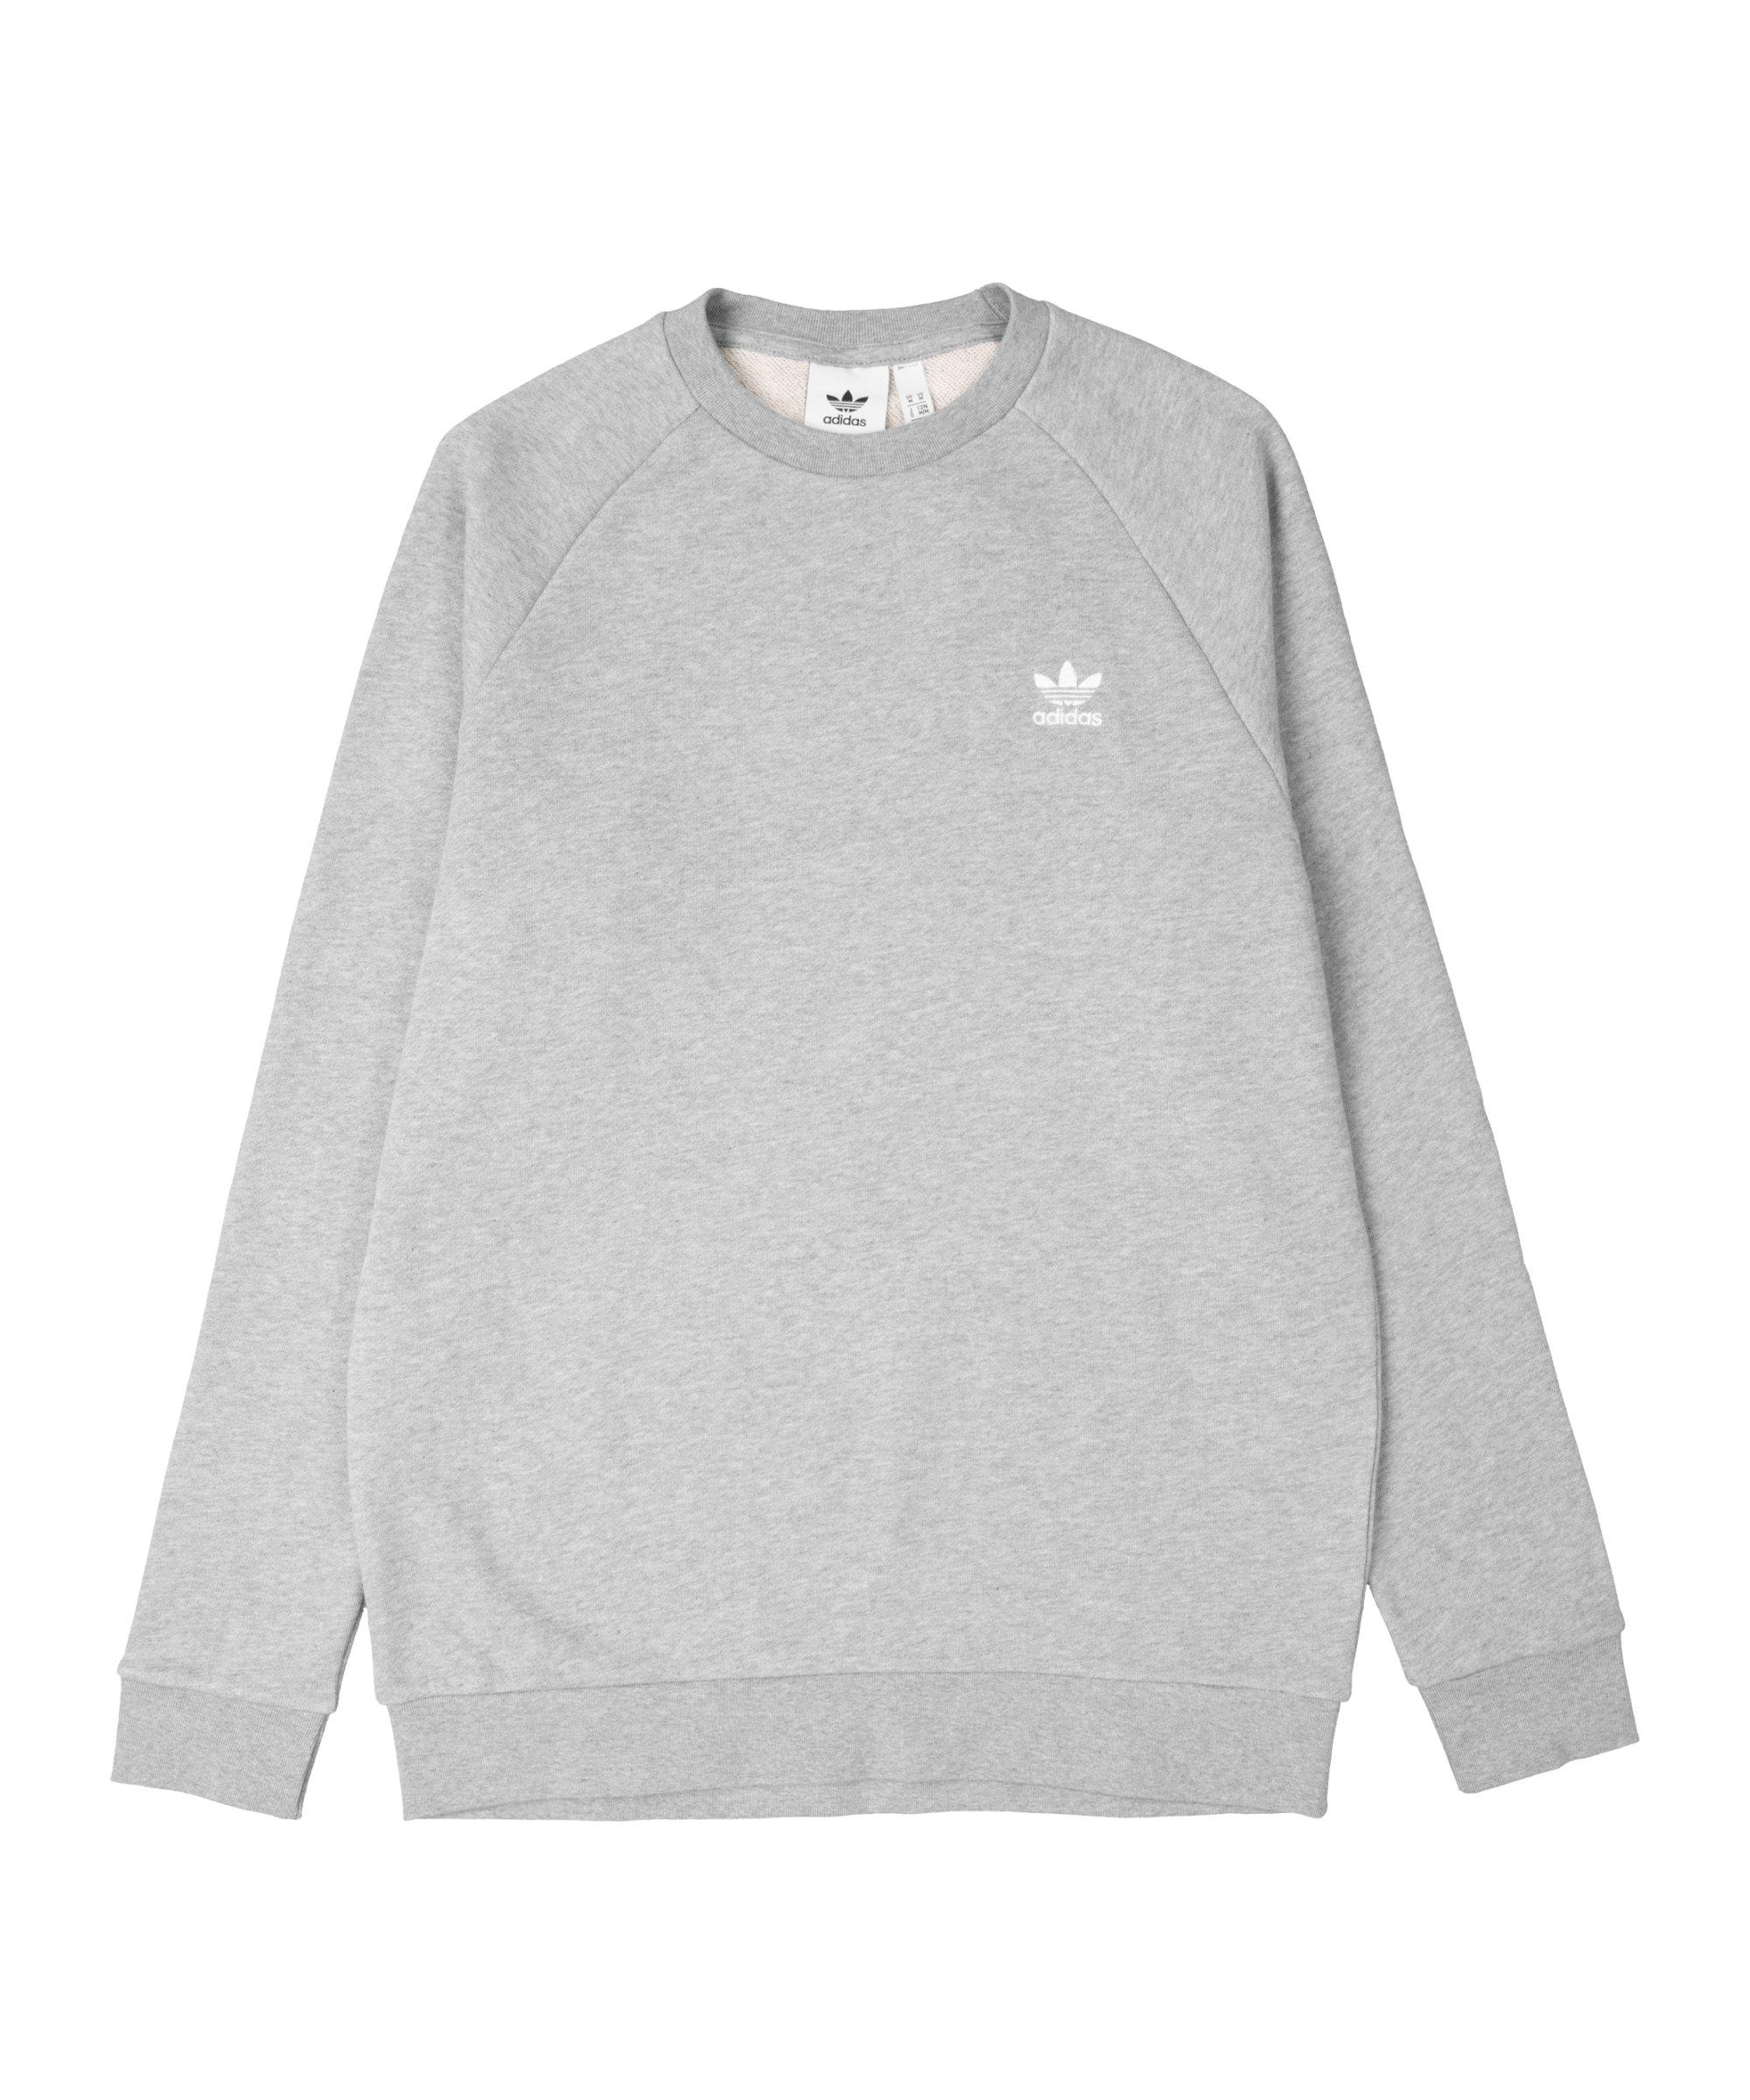 adidas Originals Essential Crew Sweatshirt Grau